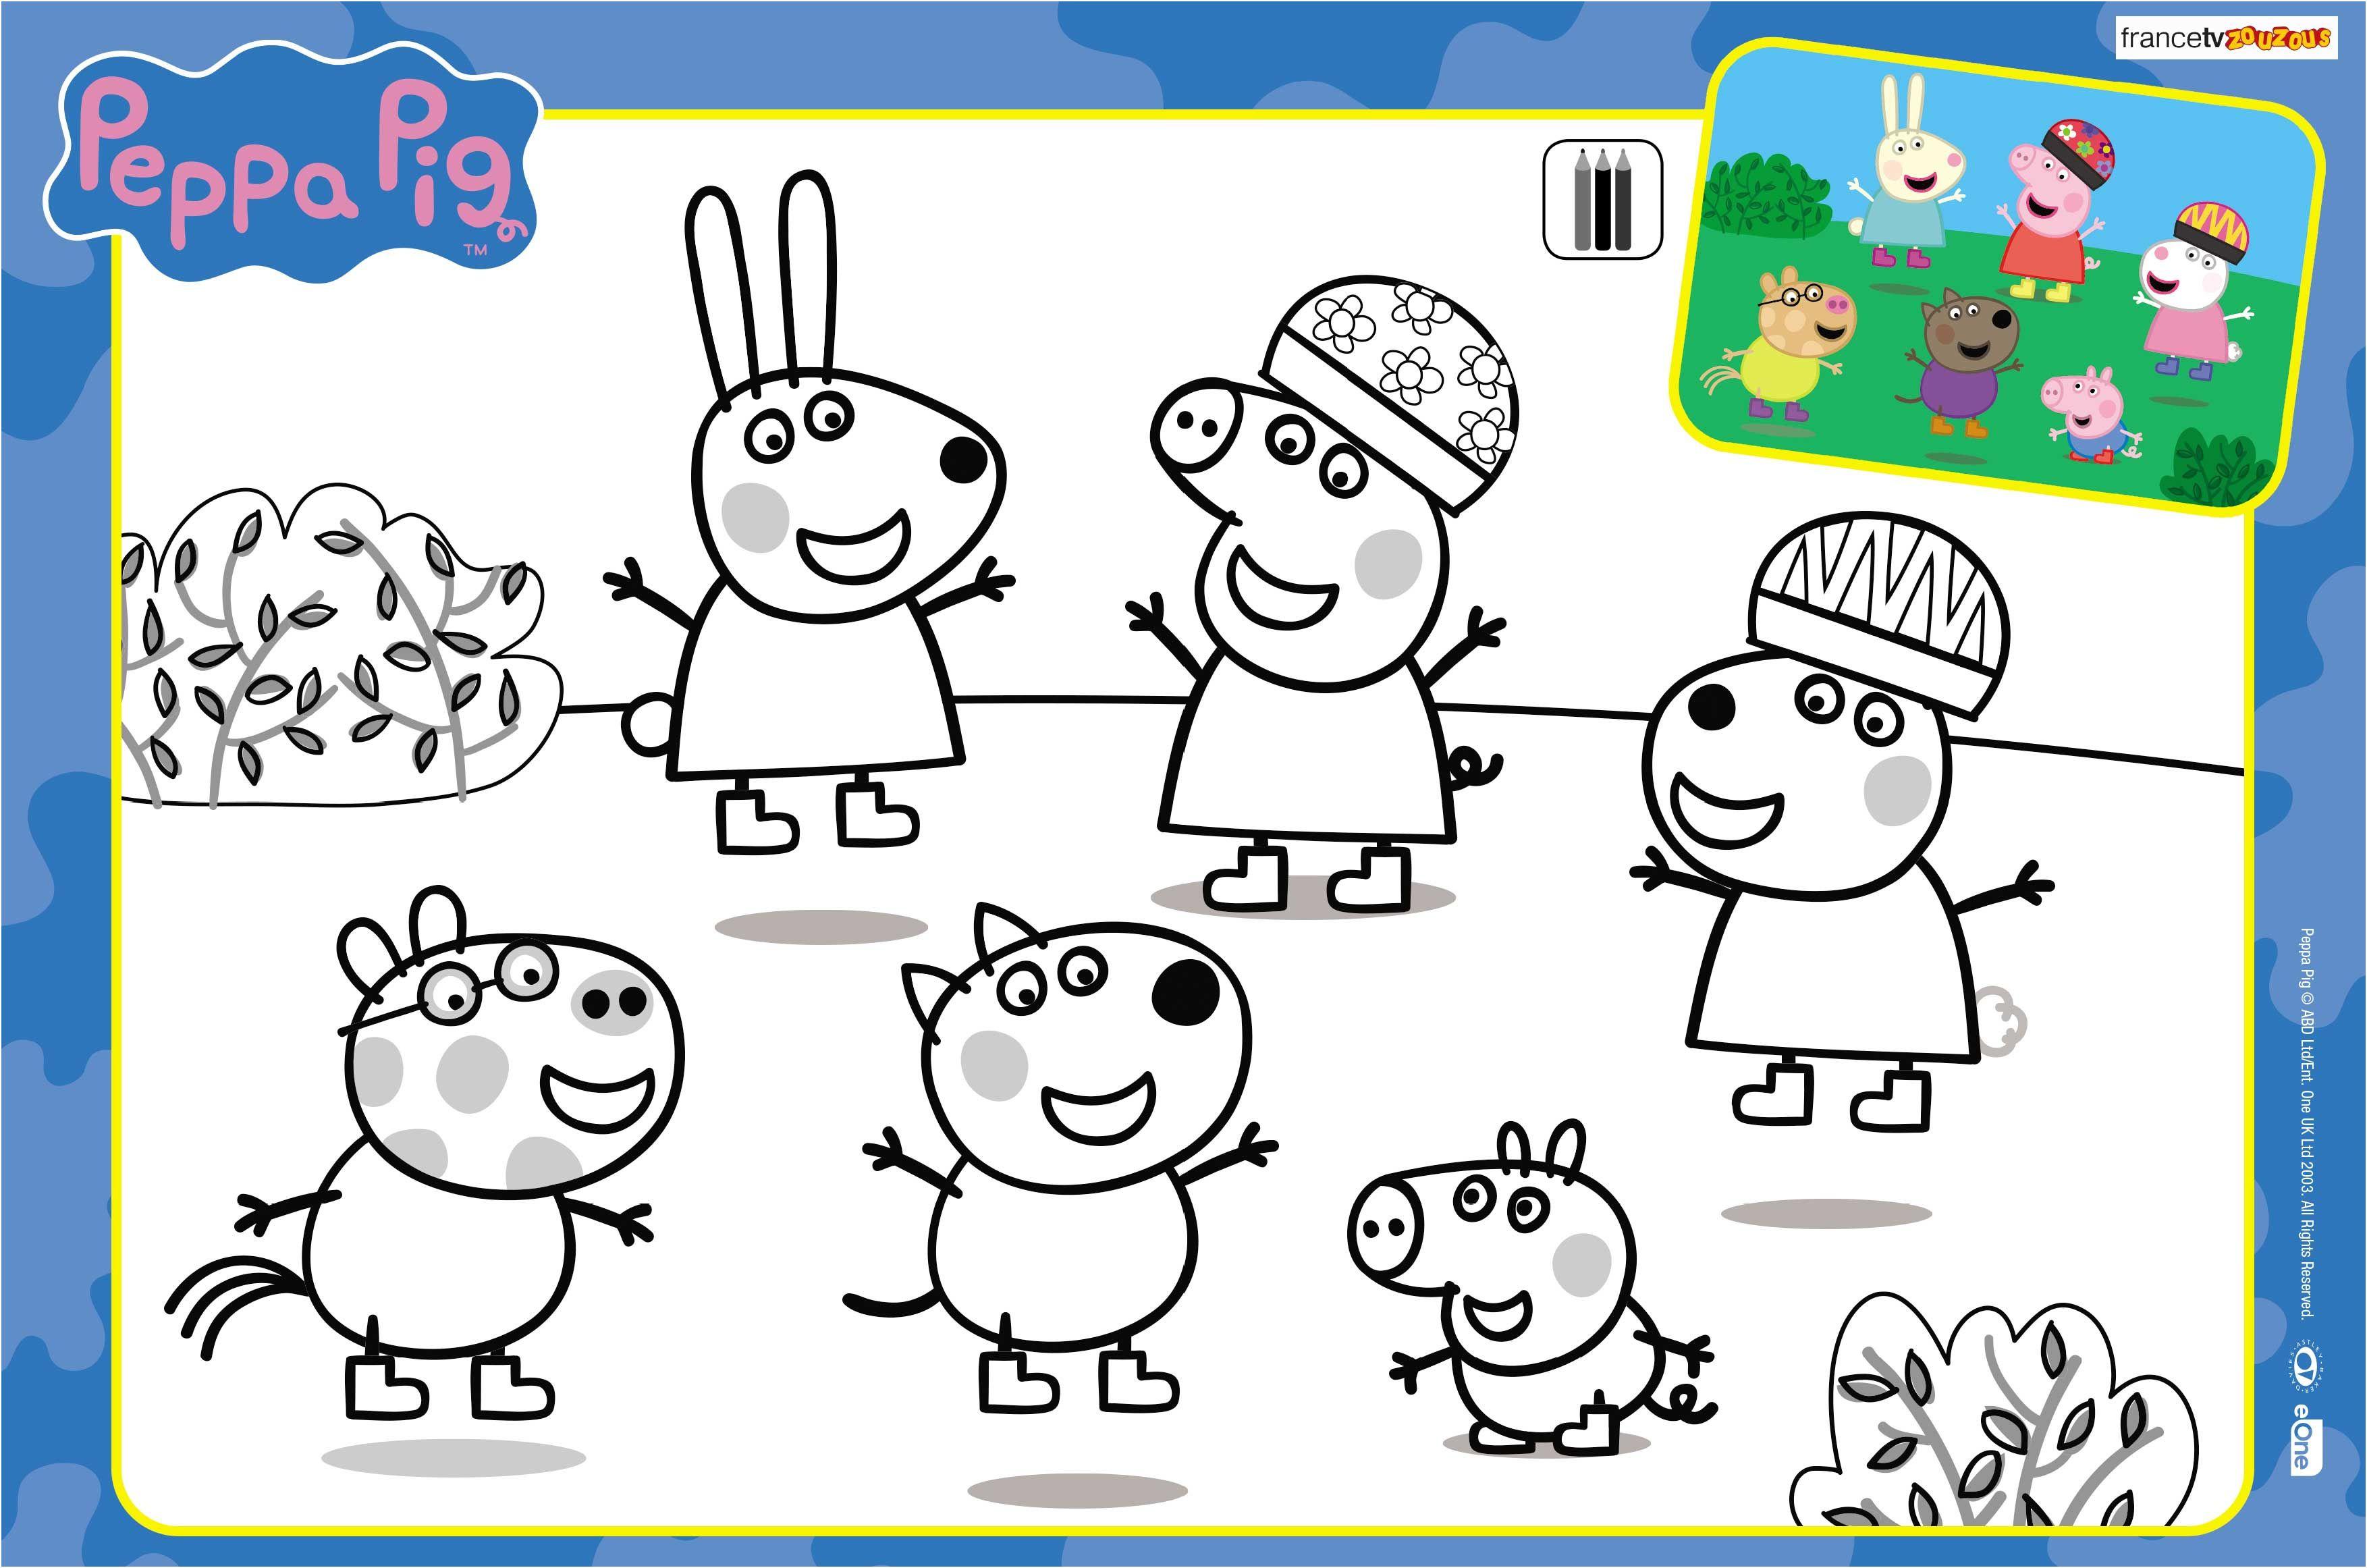 14 Pascher Coloriage Peppa Pig A Imprimer Photos Coloriage Peppa Pig Livre Coloriage Coloriage